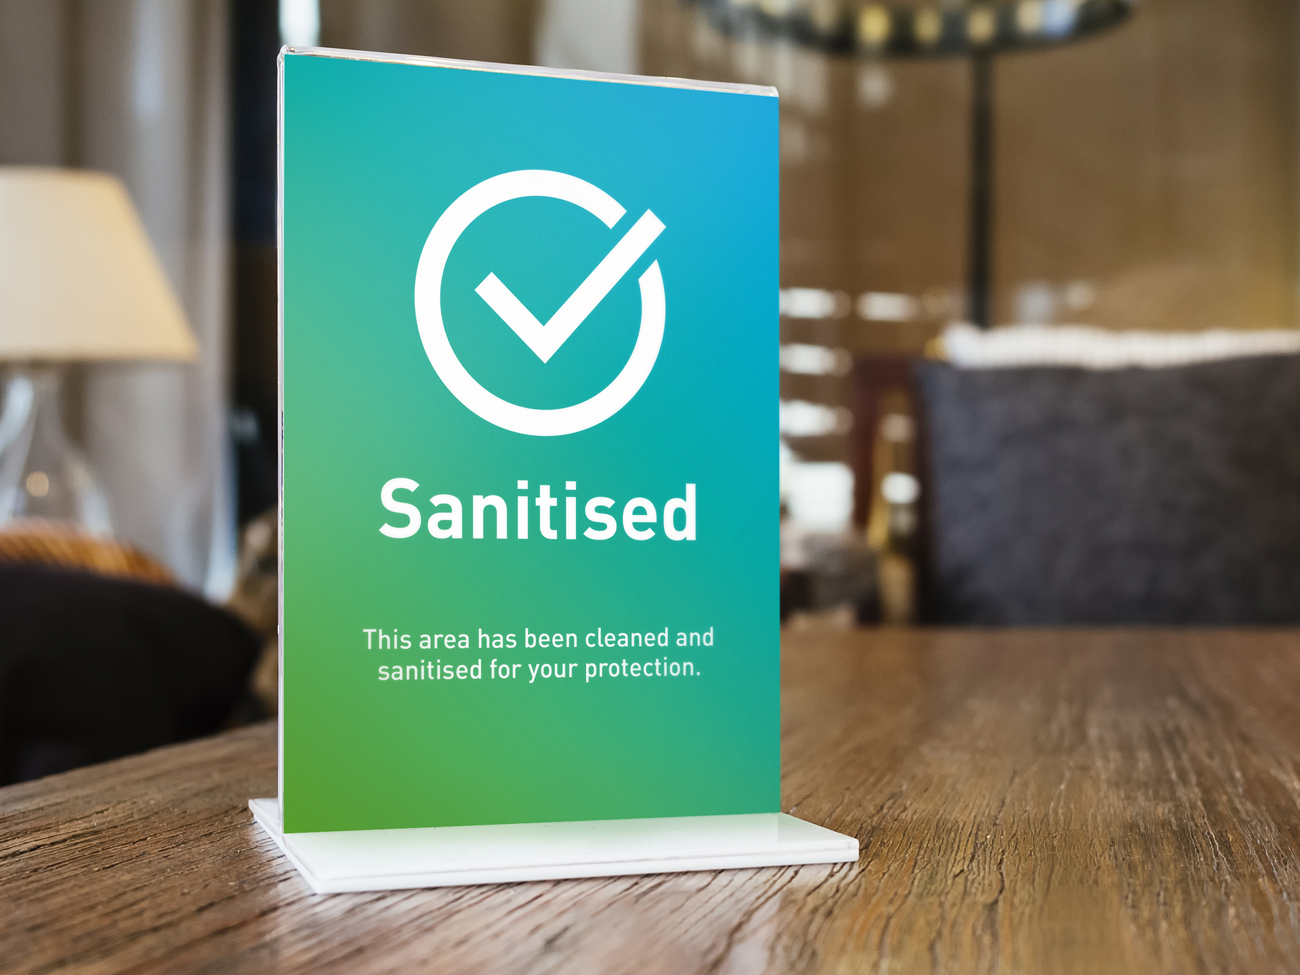 Covid clean sanitised acrylic display